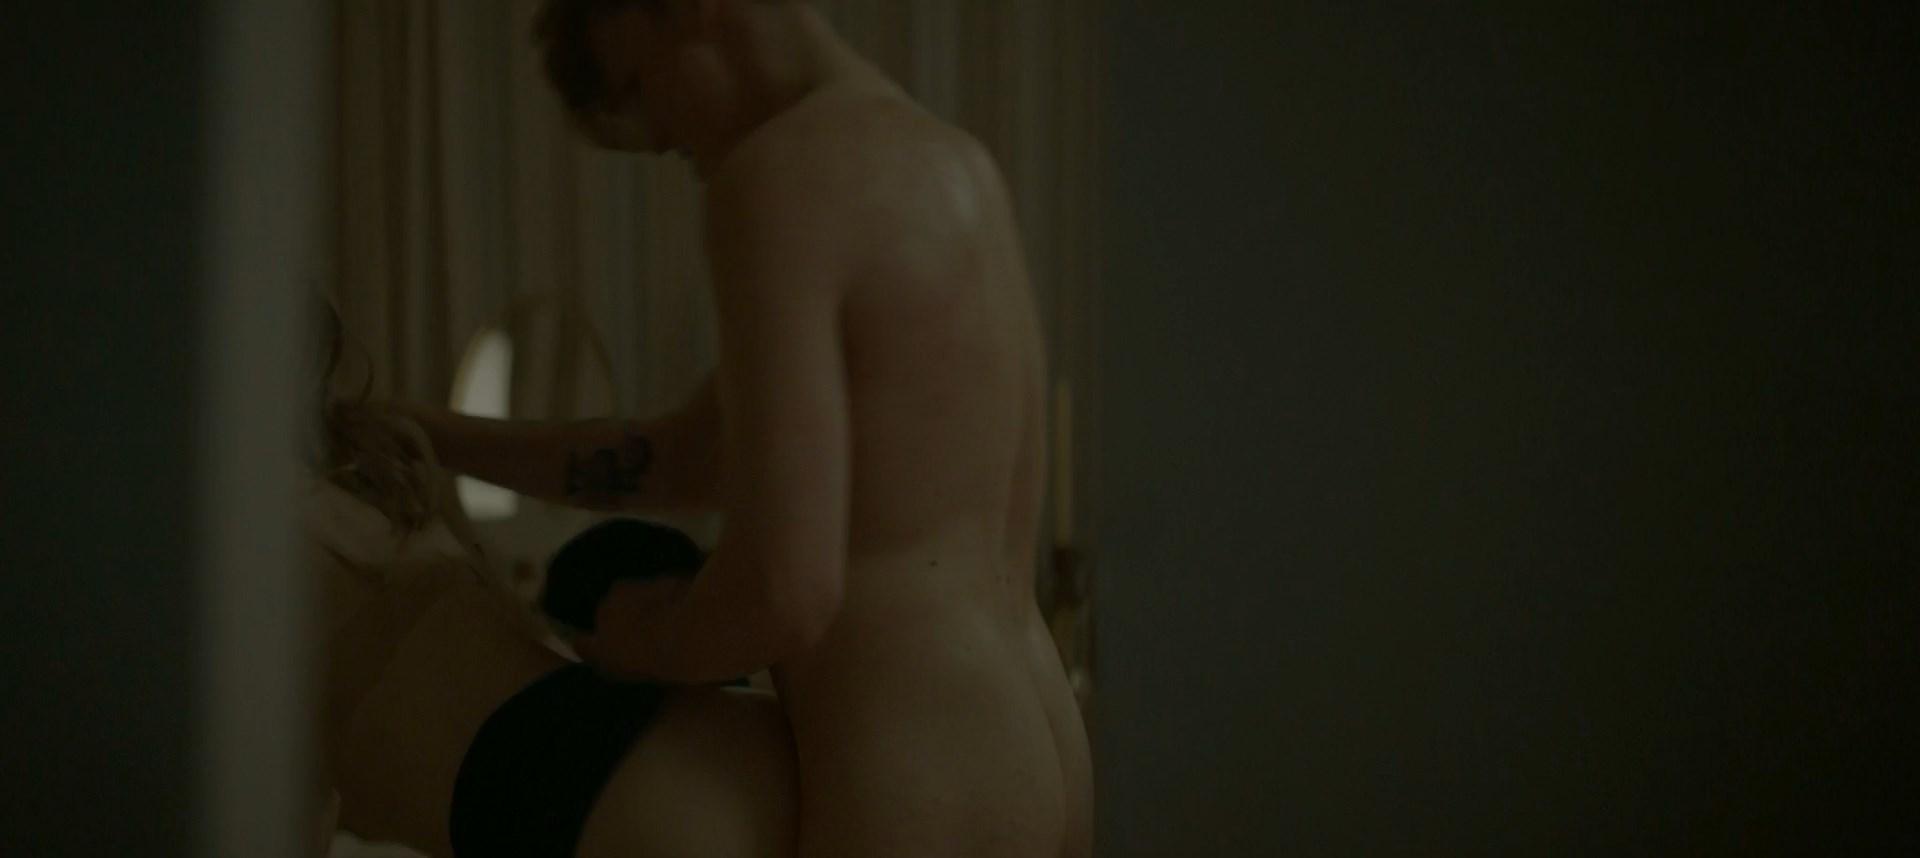 Ane Dahl Torp sexy - Interior (2018)